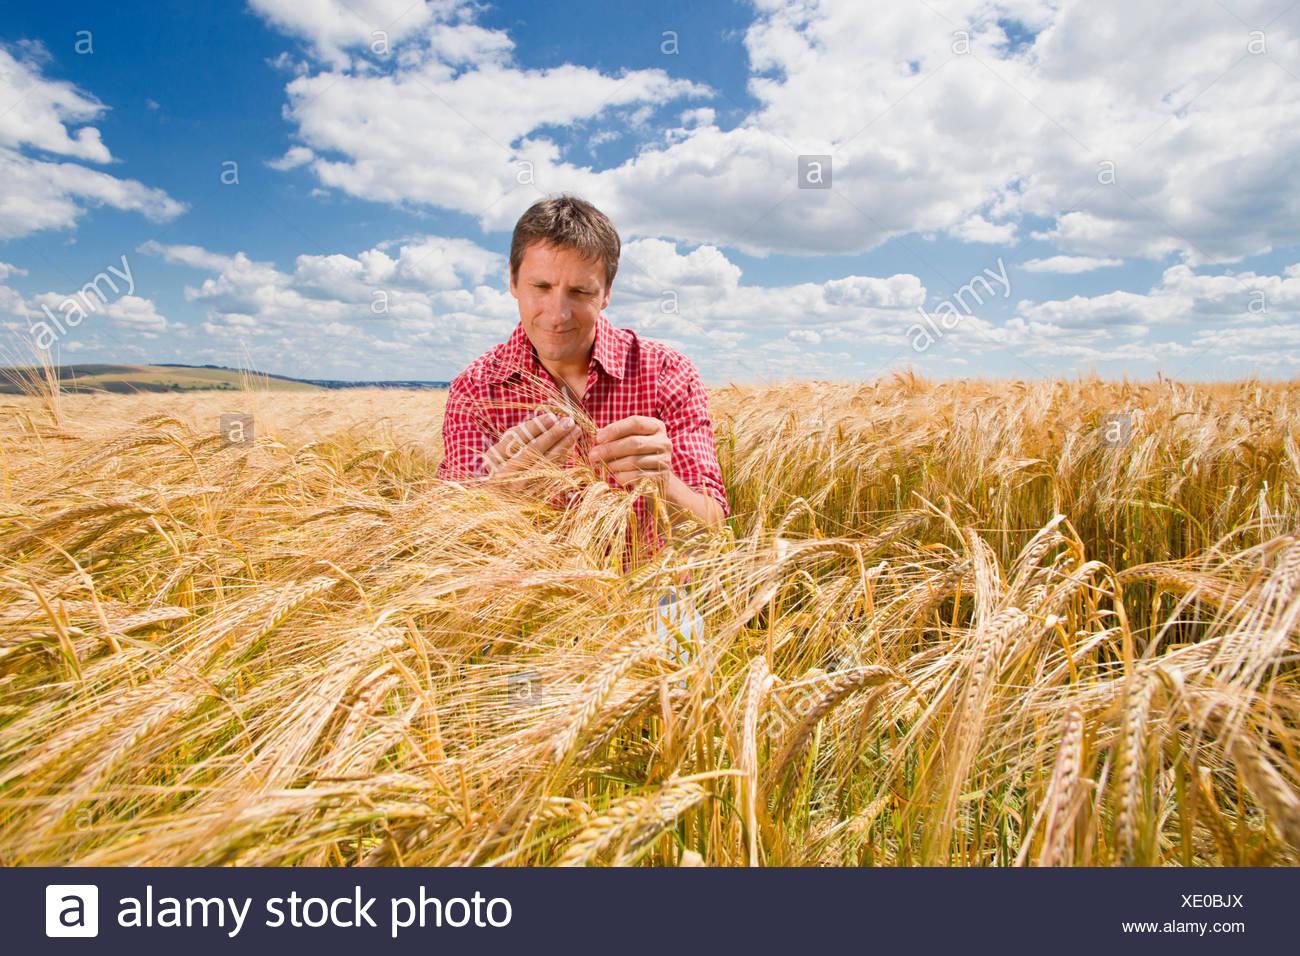 Farmer examining sunny rural barley crop field in summer Stock Photo